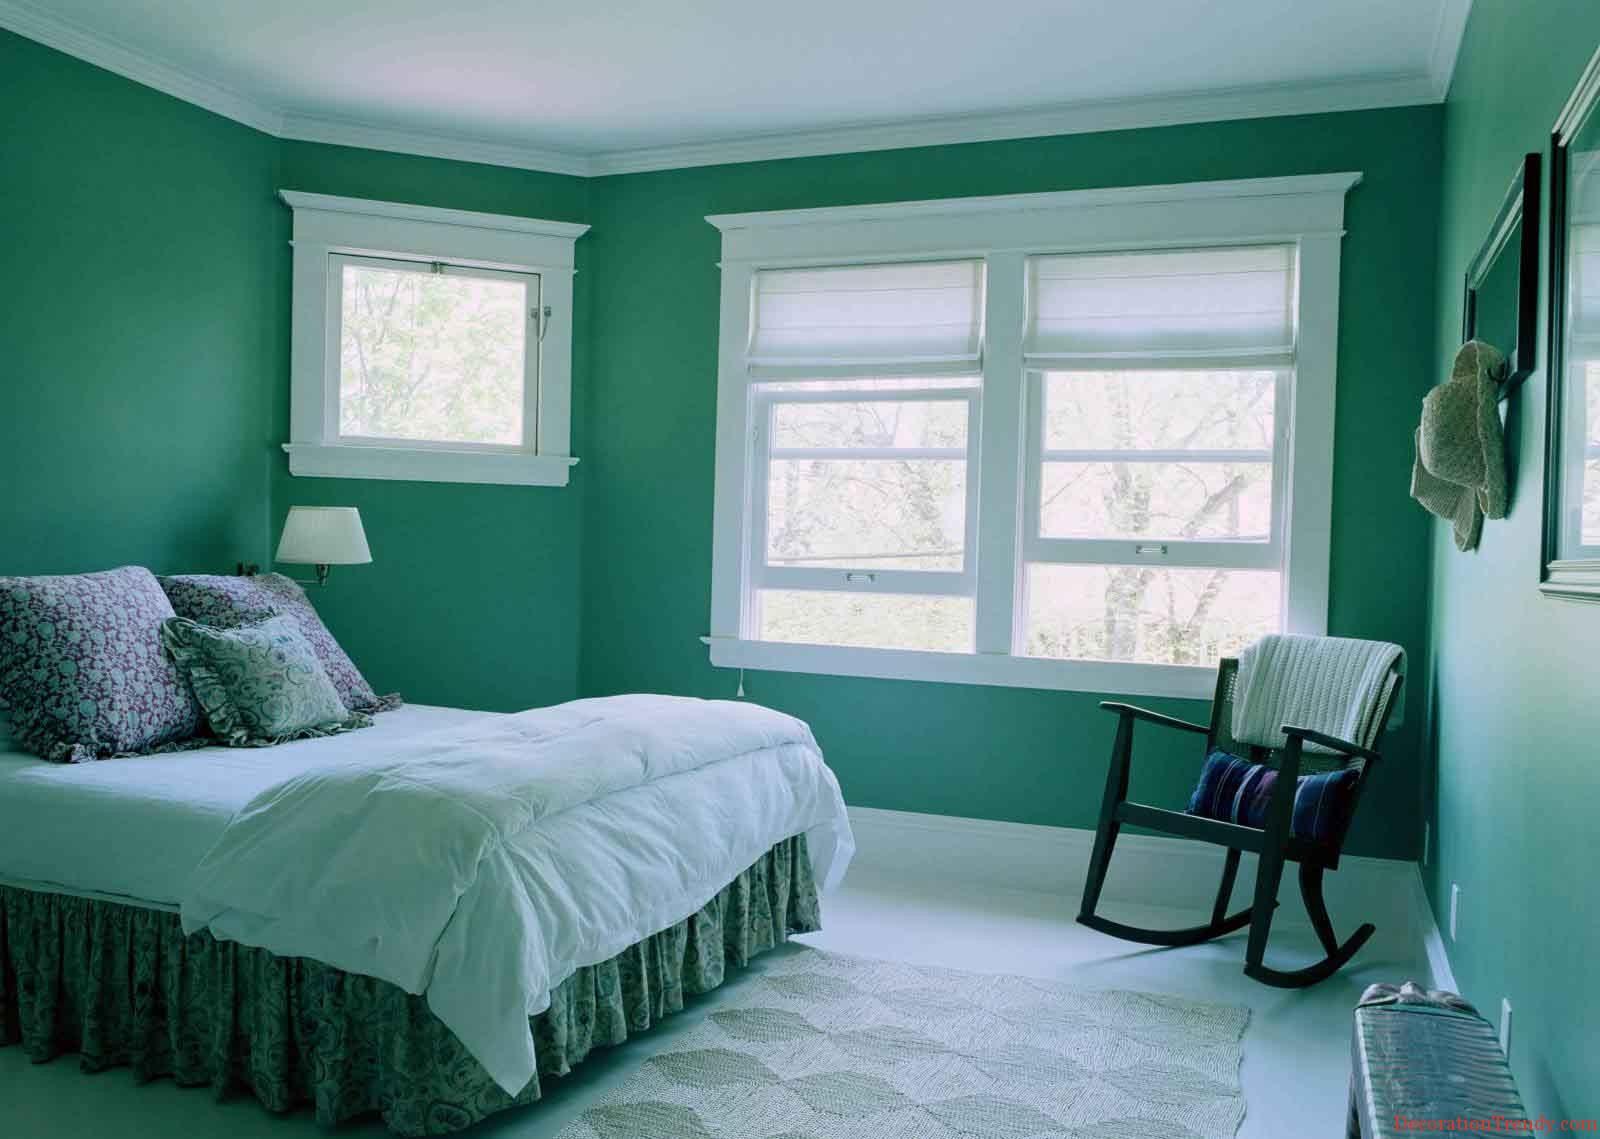 10 Unique Master Bedroom Wall Color Ideas simple bedroom paint ideas low budget interior design